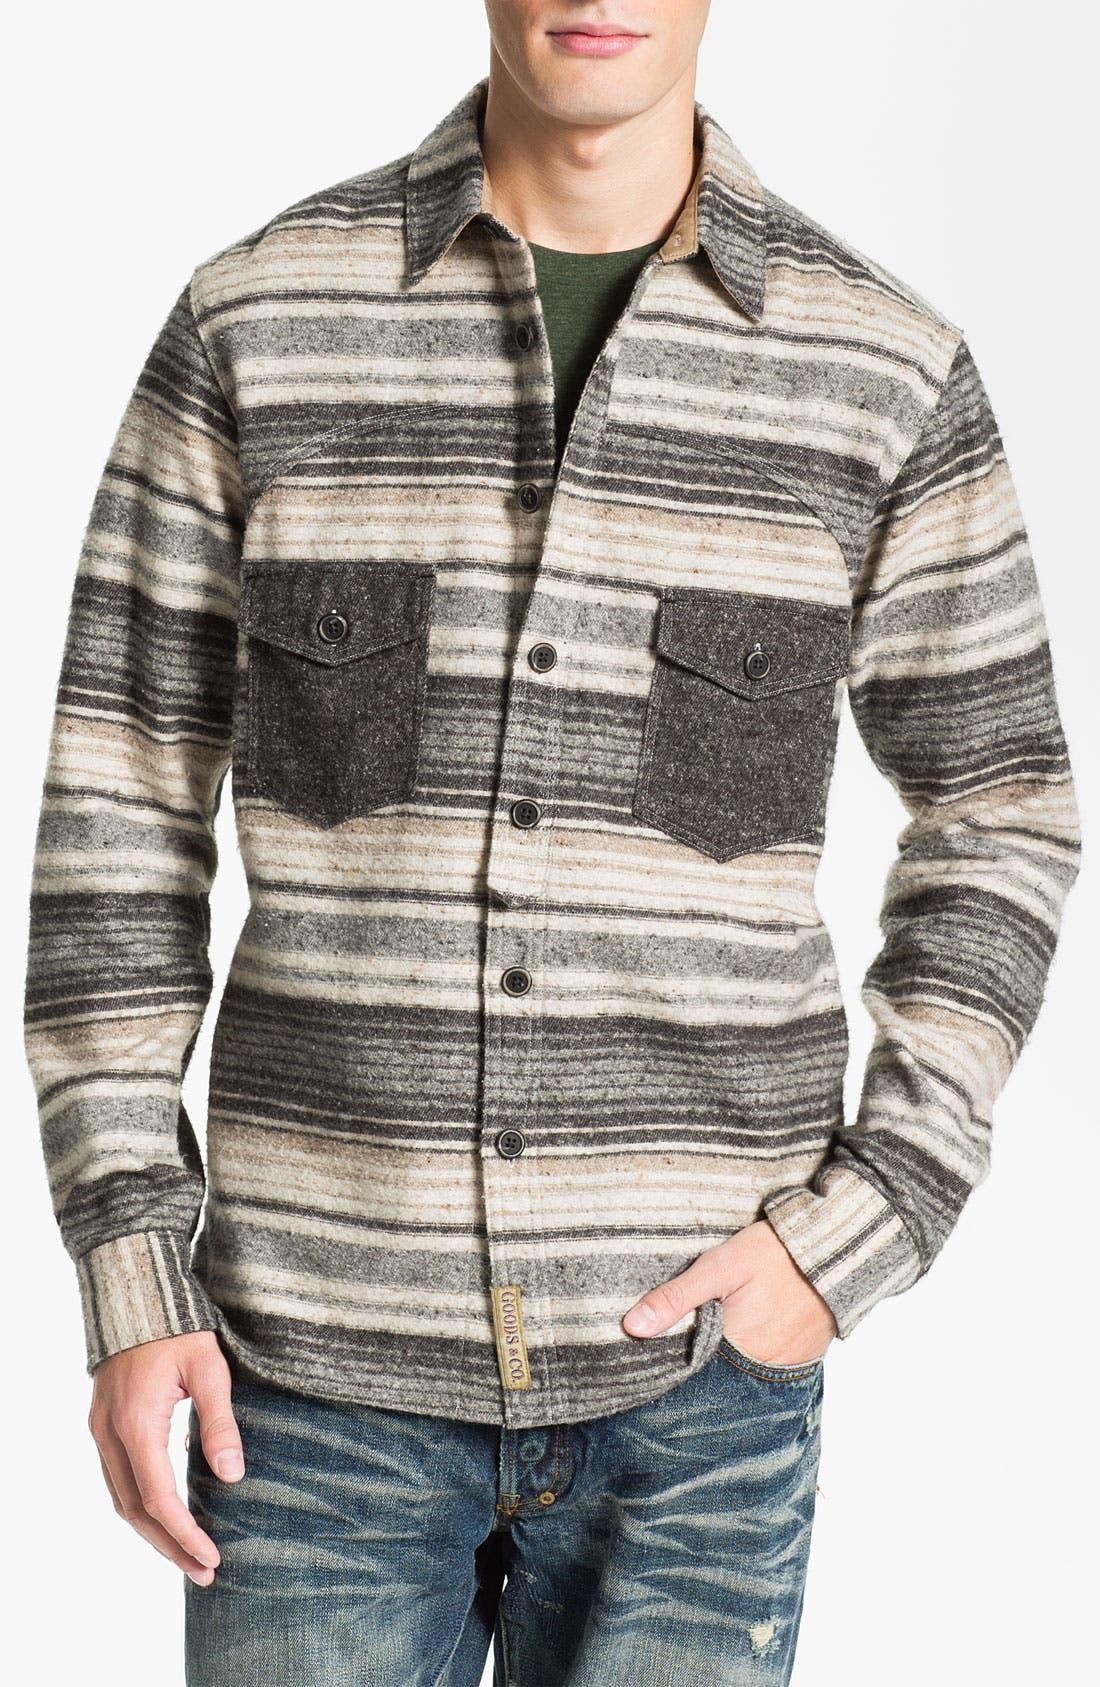 Alternate Image 1 Selected - PRPS Horizontal Stripe Flannel Shirt